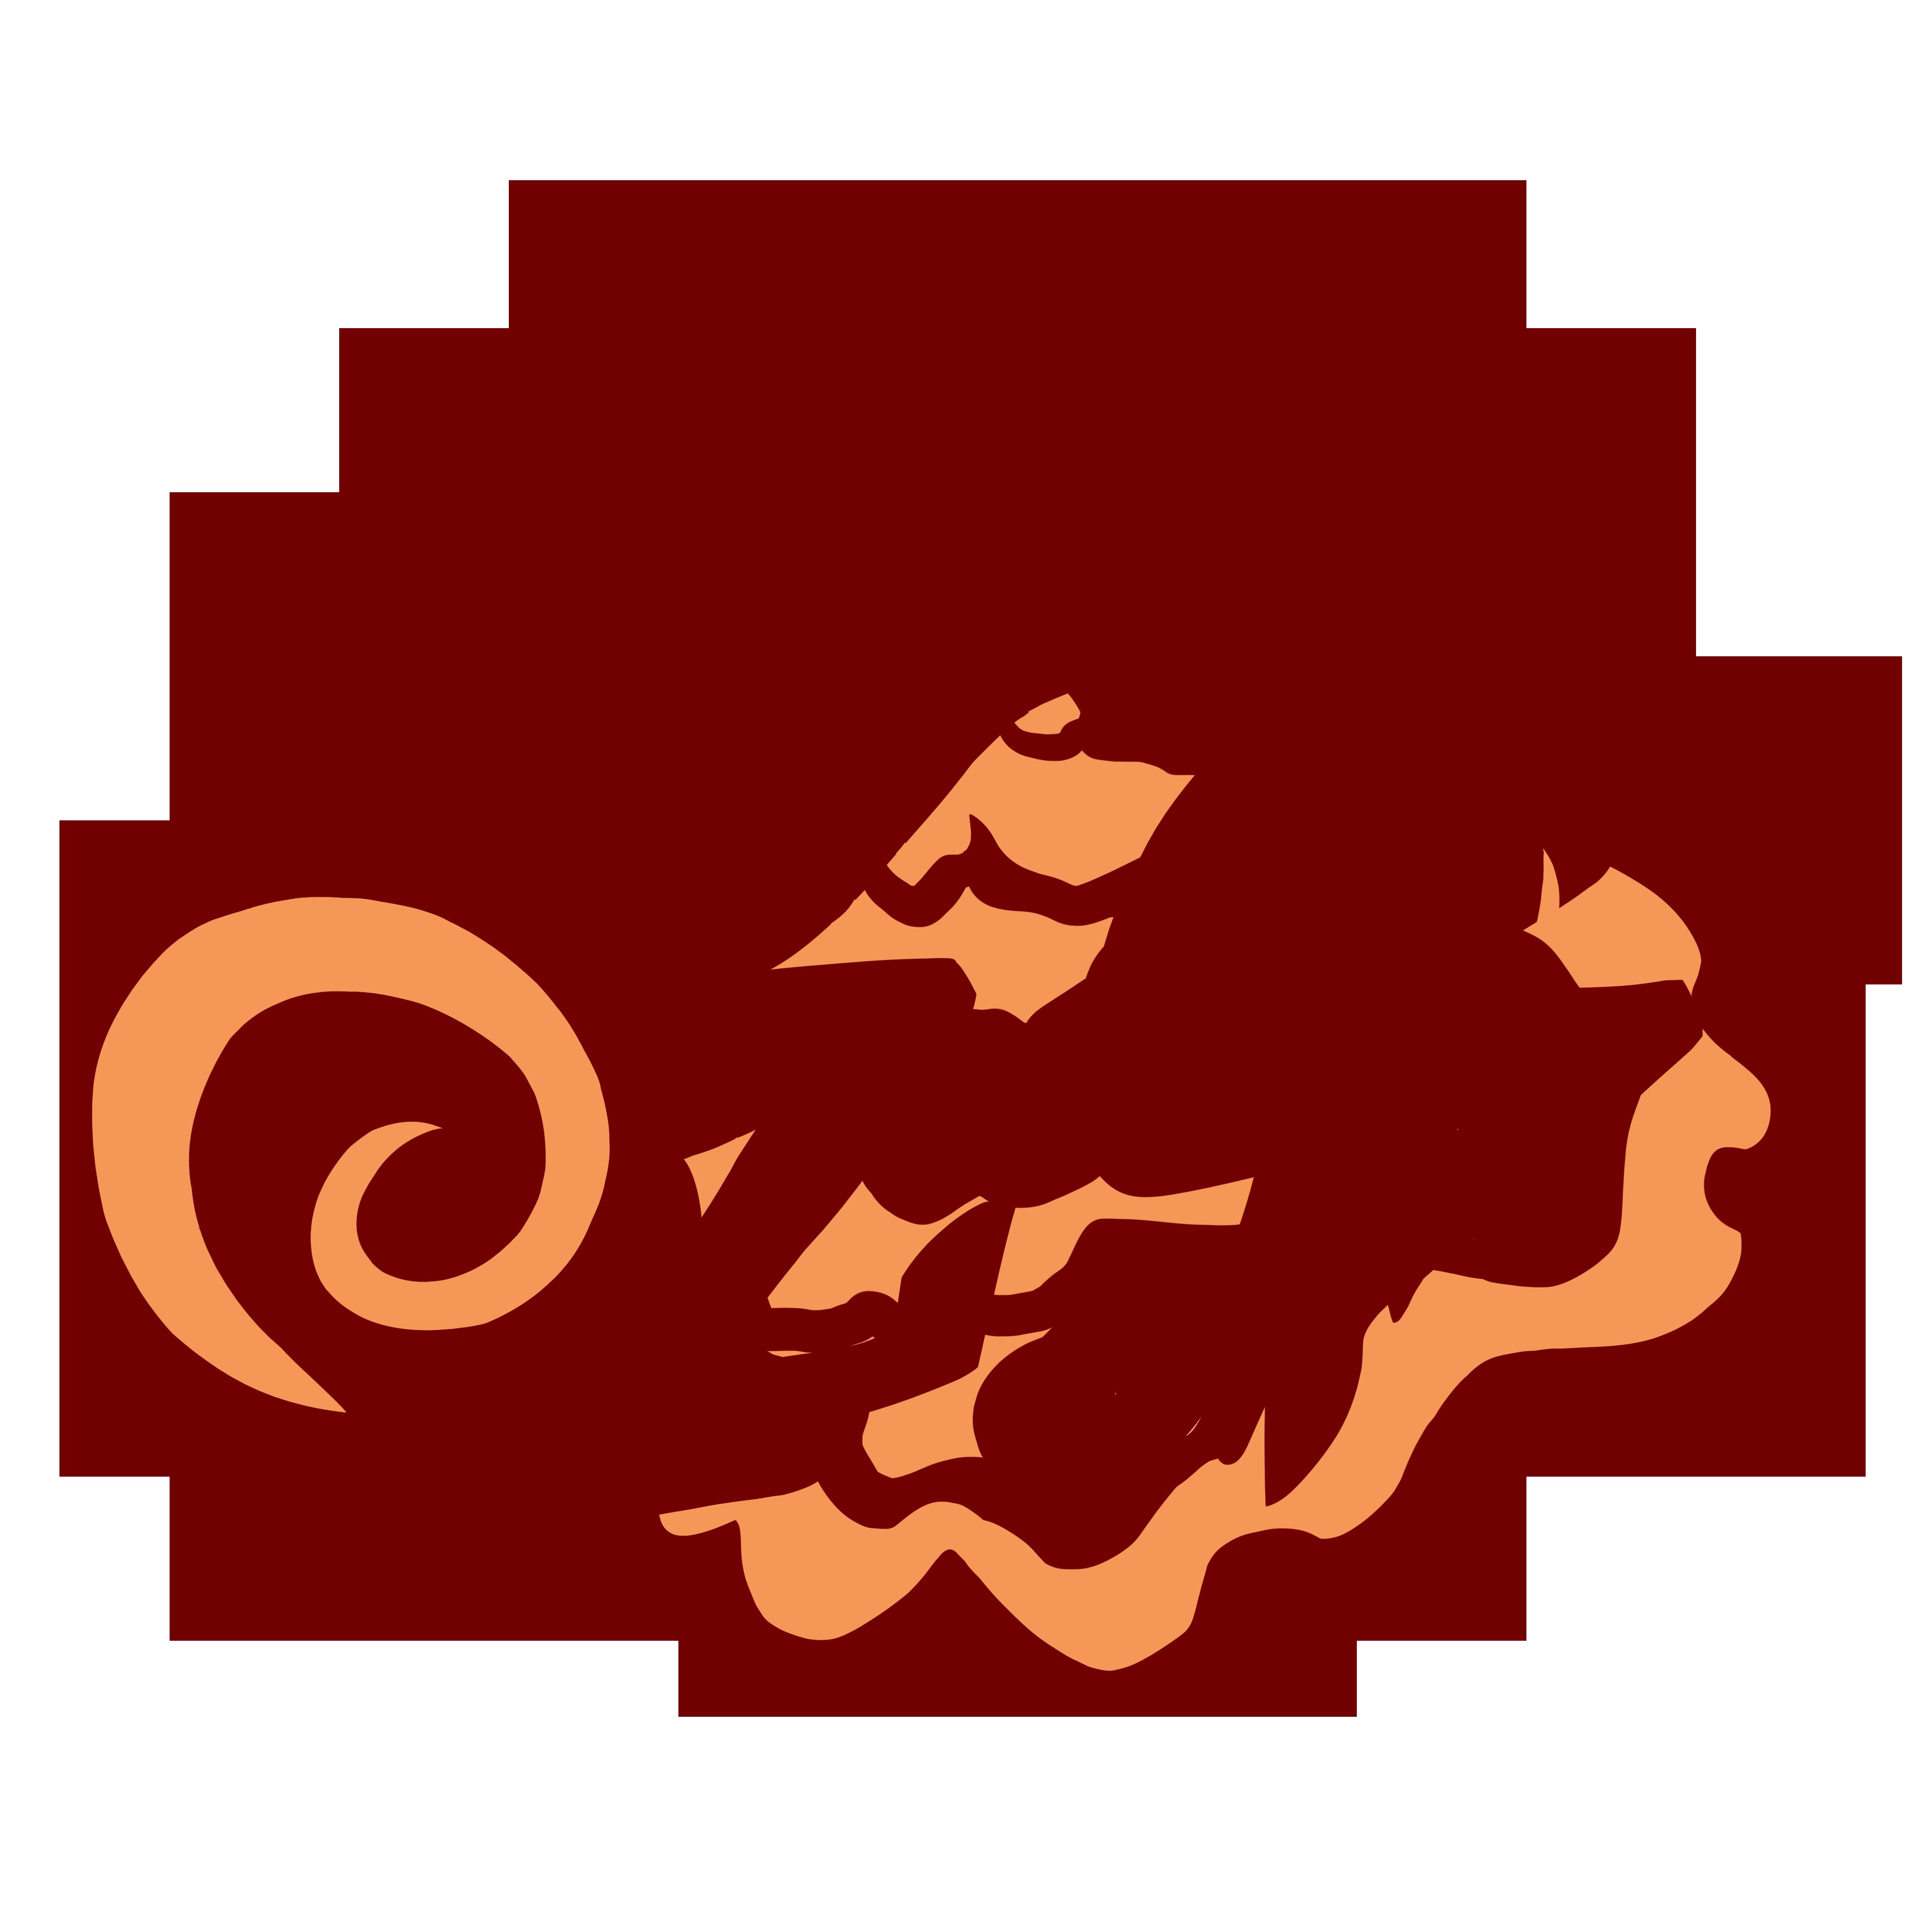 Ramguts logo